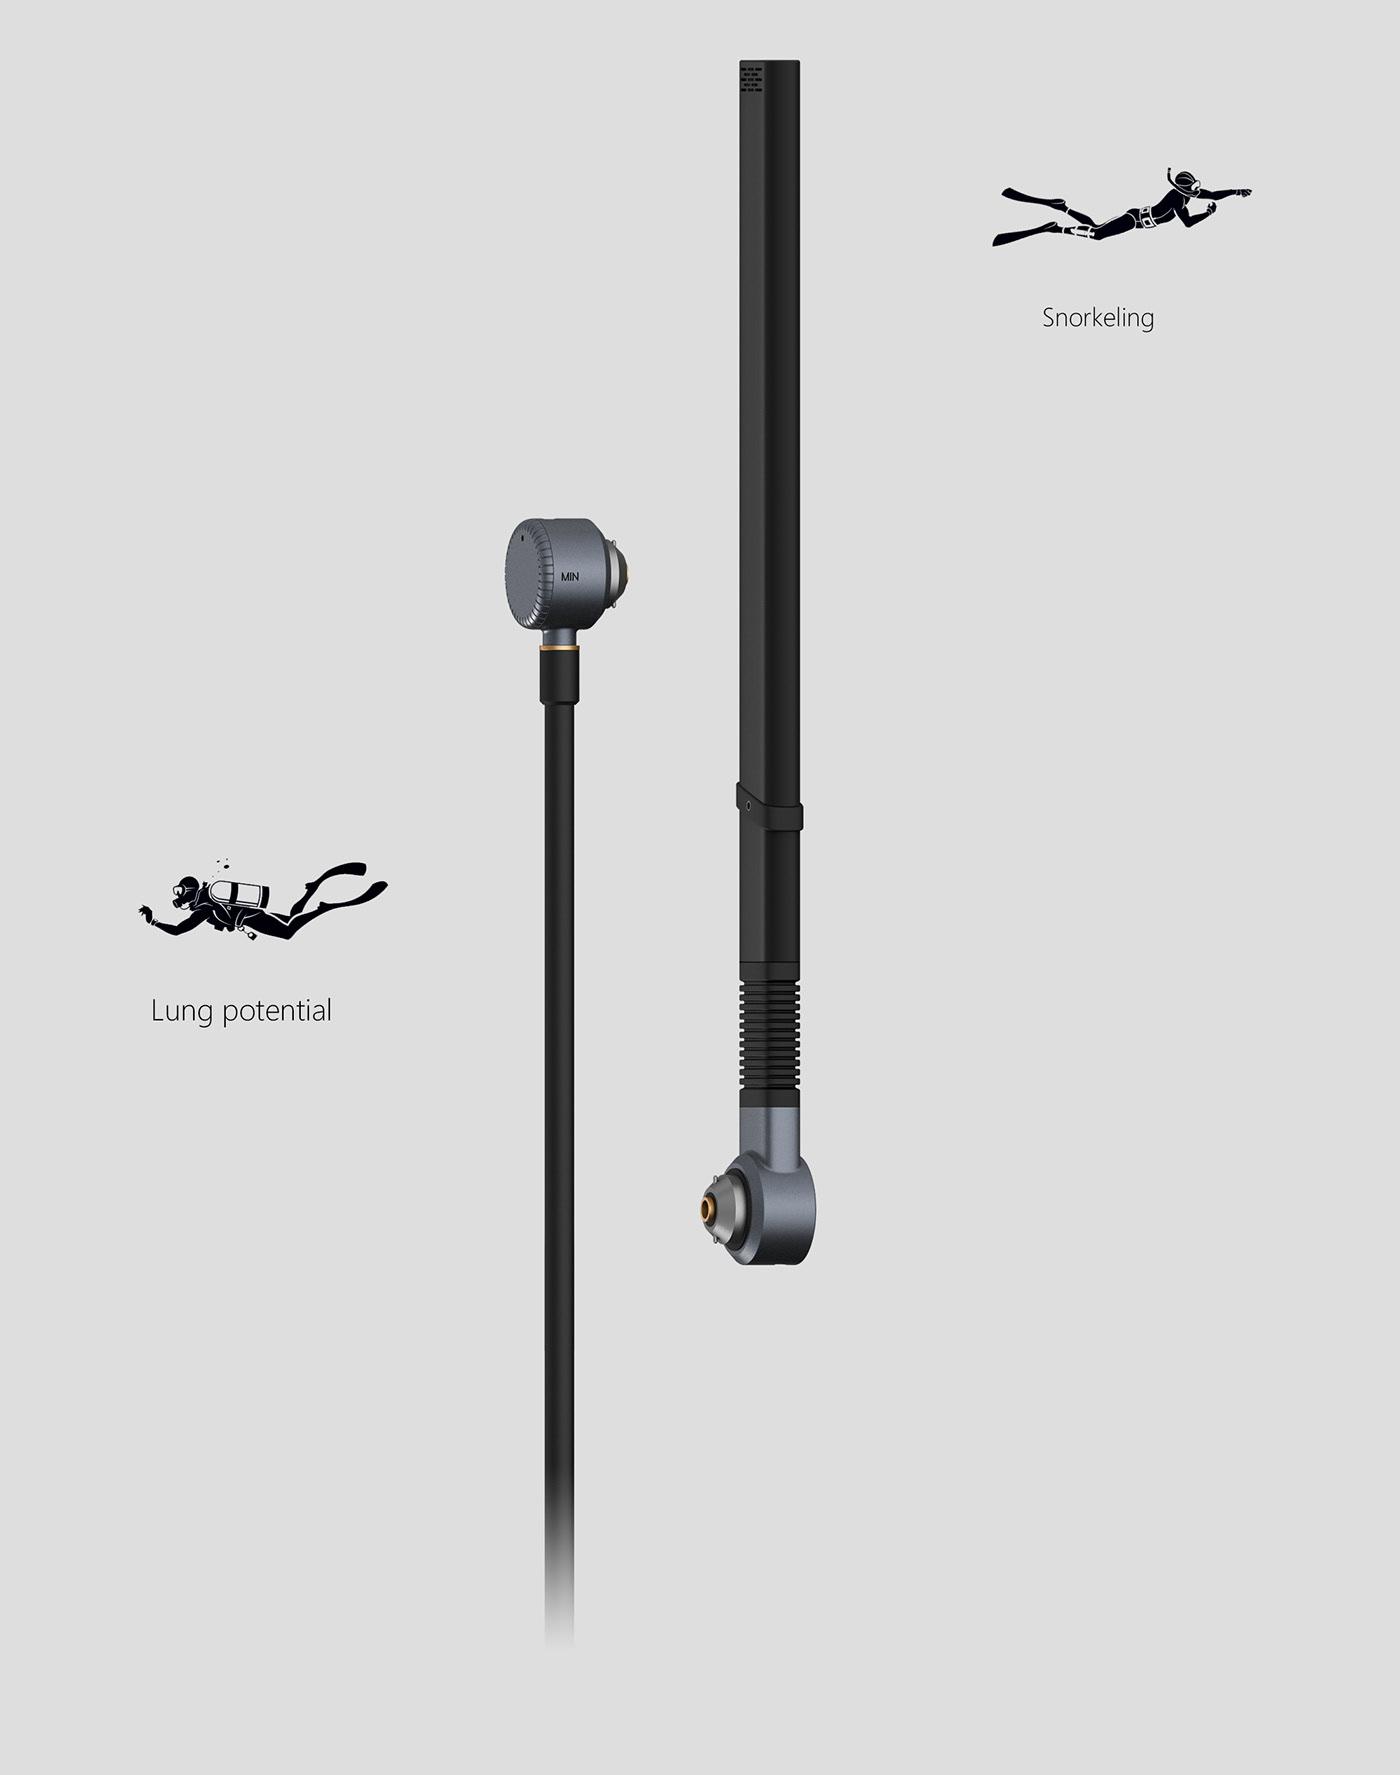 smart-diving-d-mask-concept-noko-08.jpg